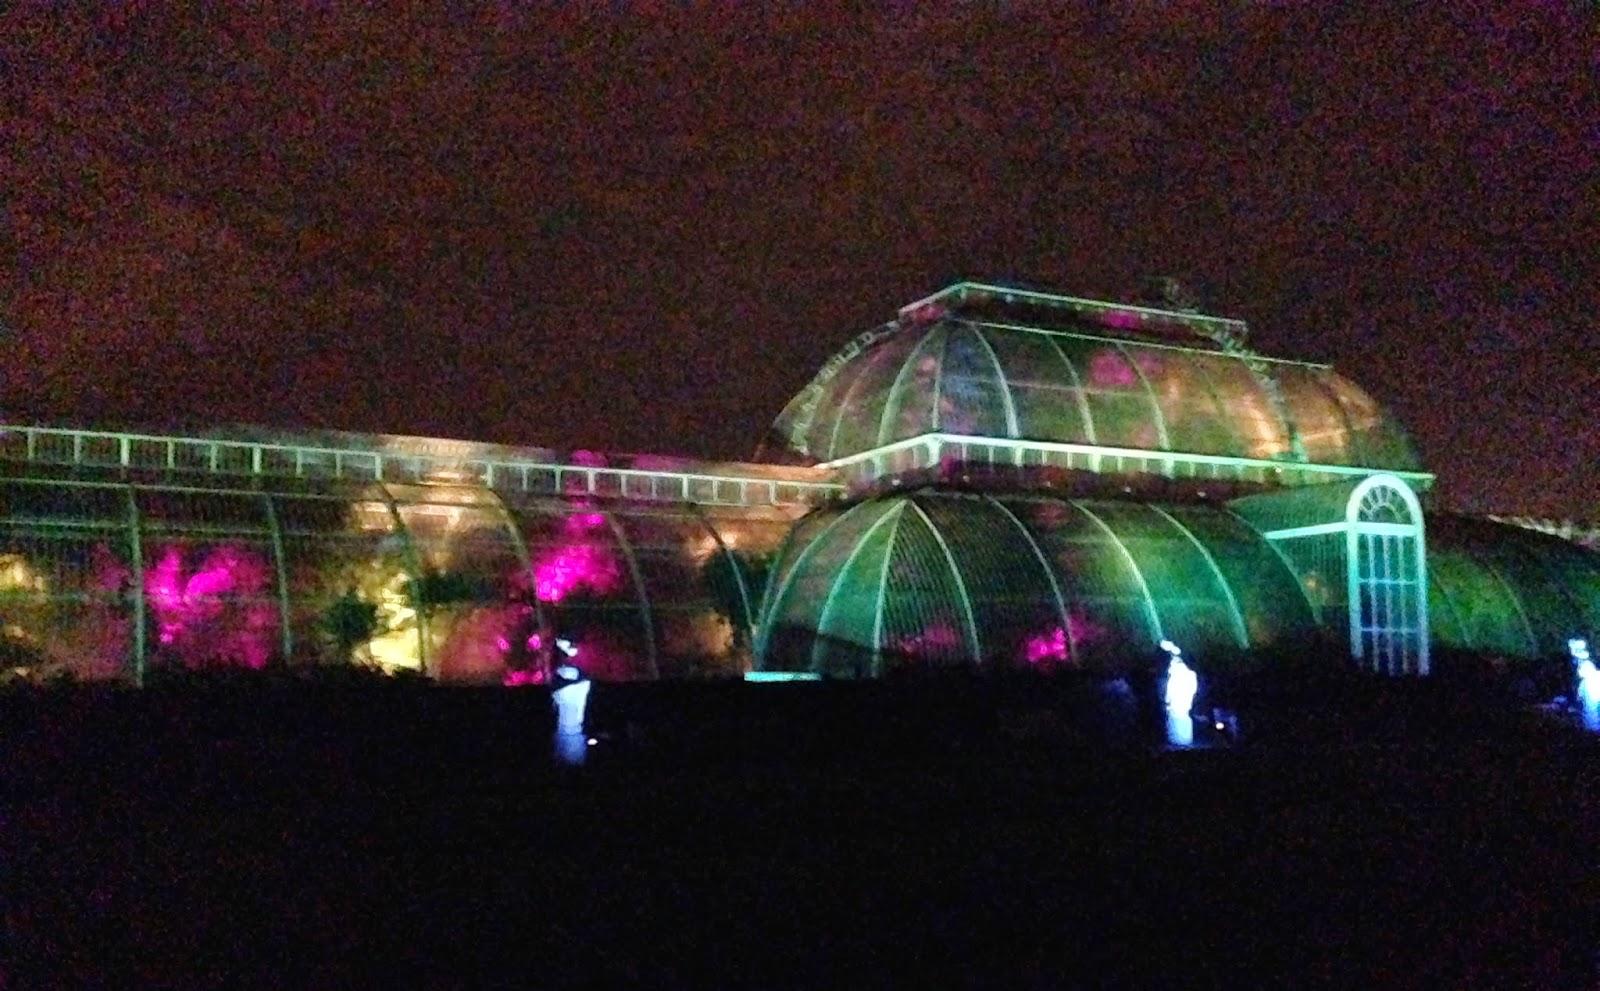 Kew Christmas Illuminated Walk